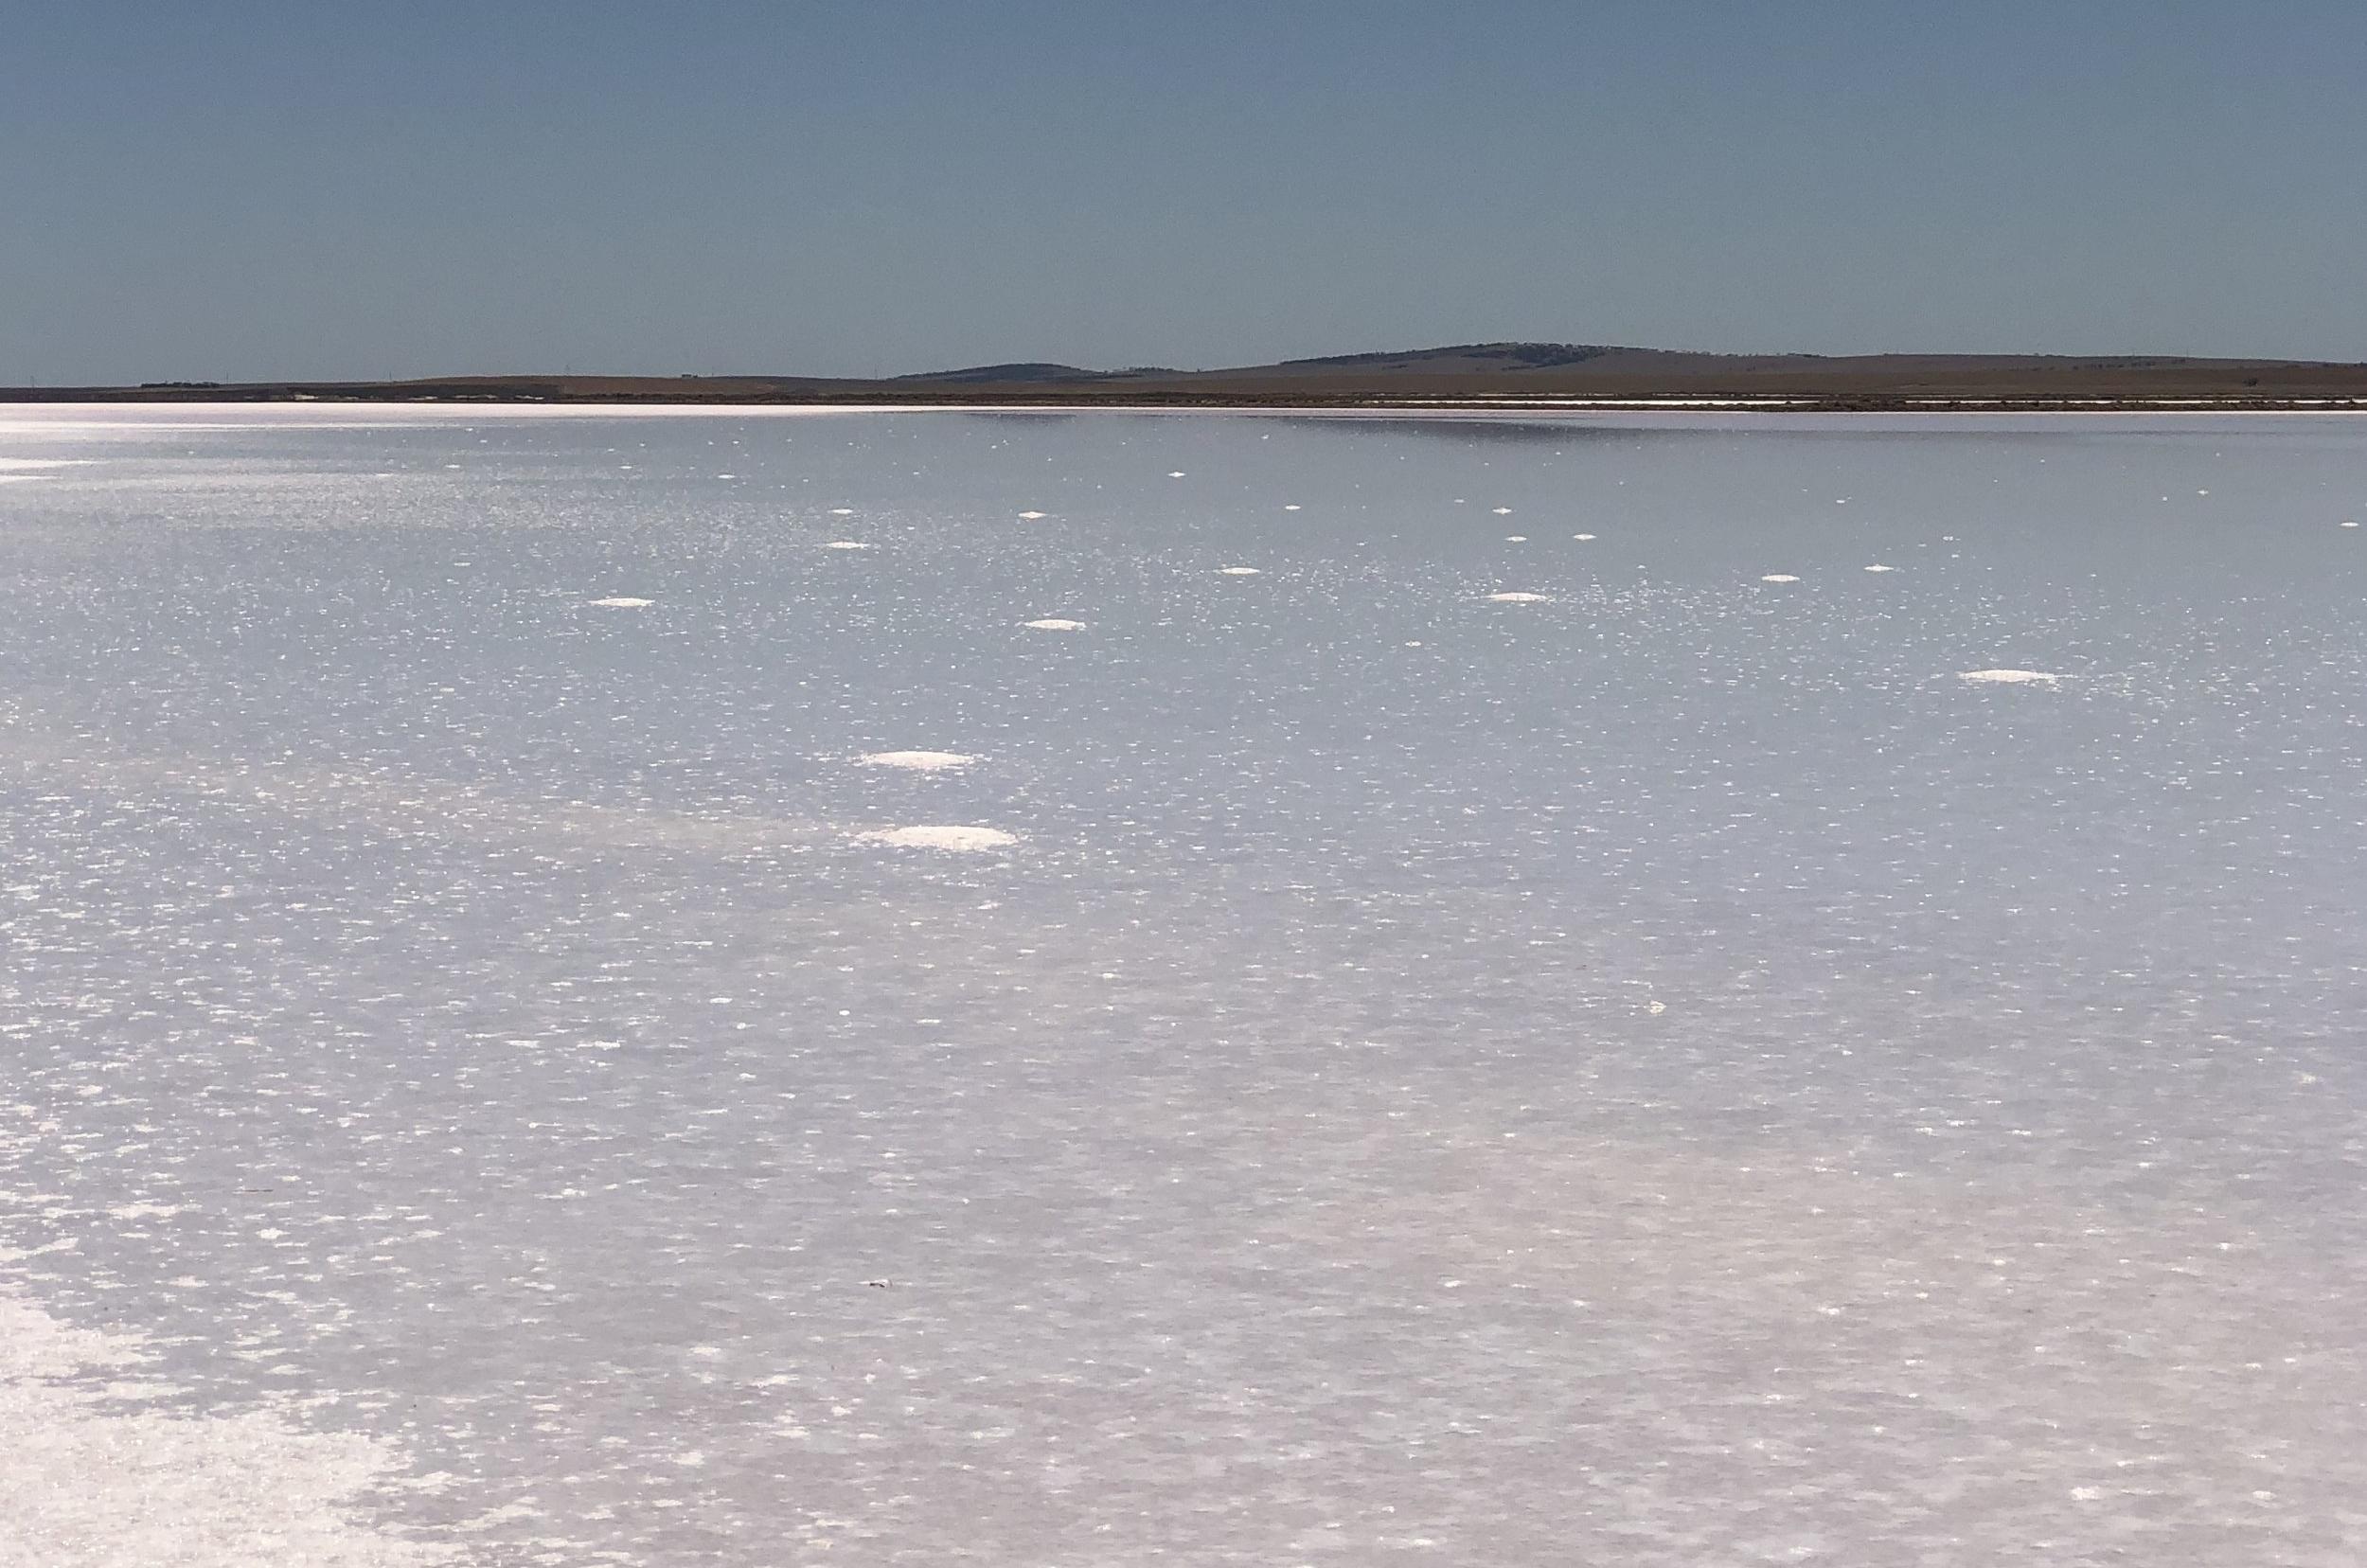 Lake Bumbunga, that you? You're looking kinda pale.